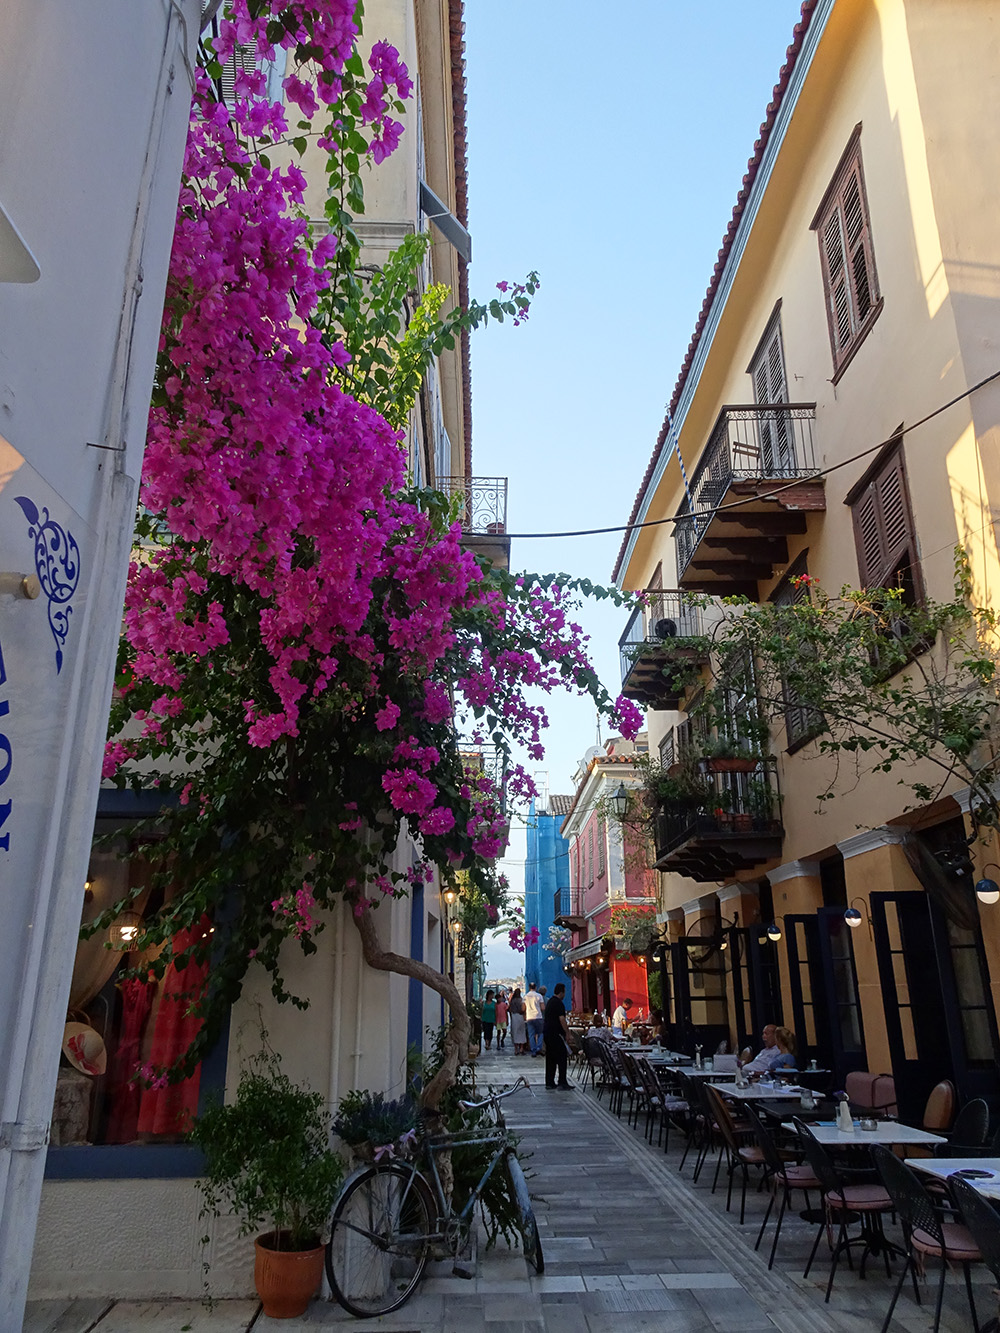 De mooiste straatjes in de binnenstad van Náuplion